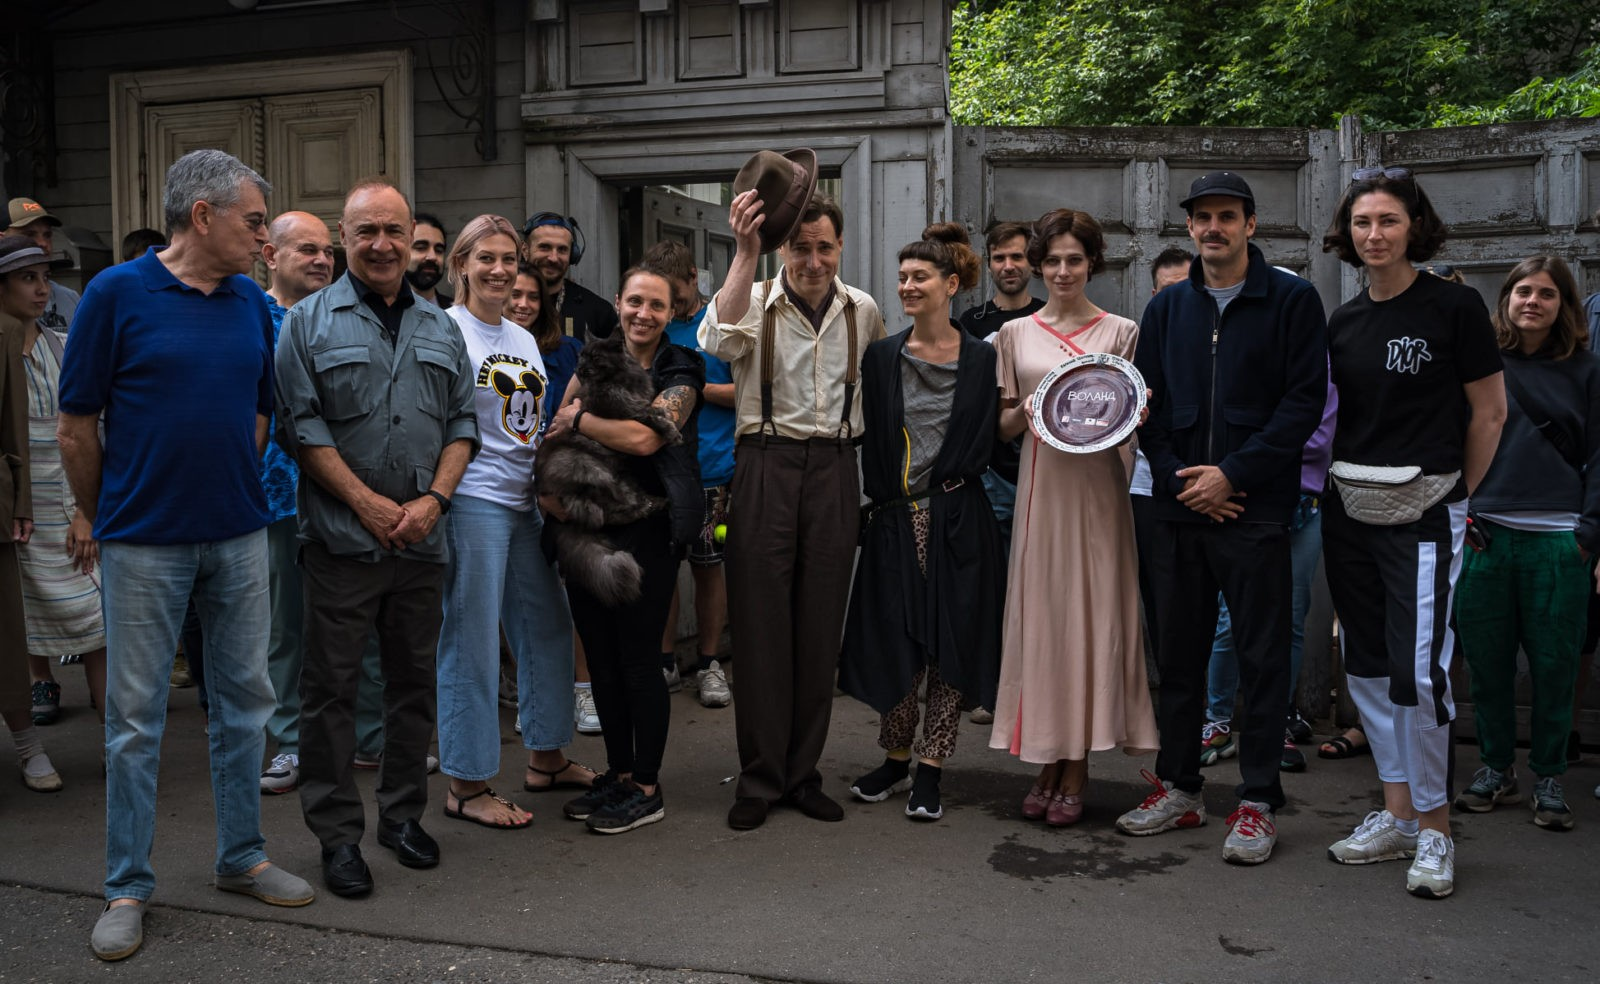 В Москве стартовали съемки фильма «Воланд» по роману Булгакова